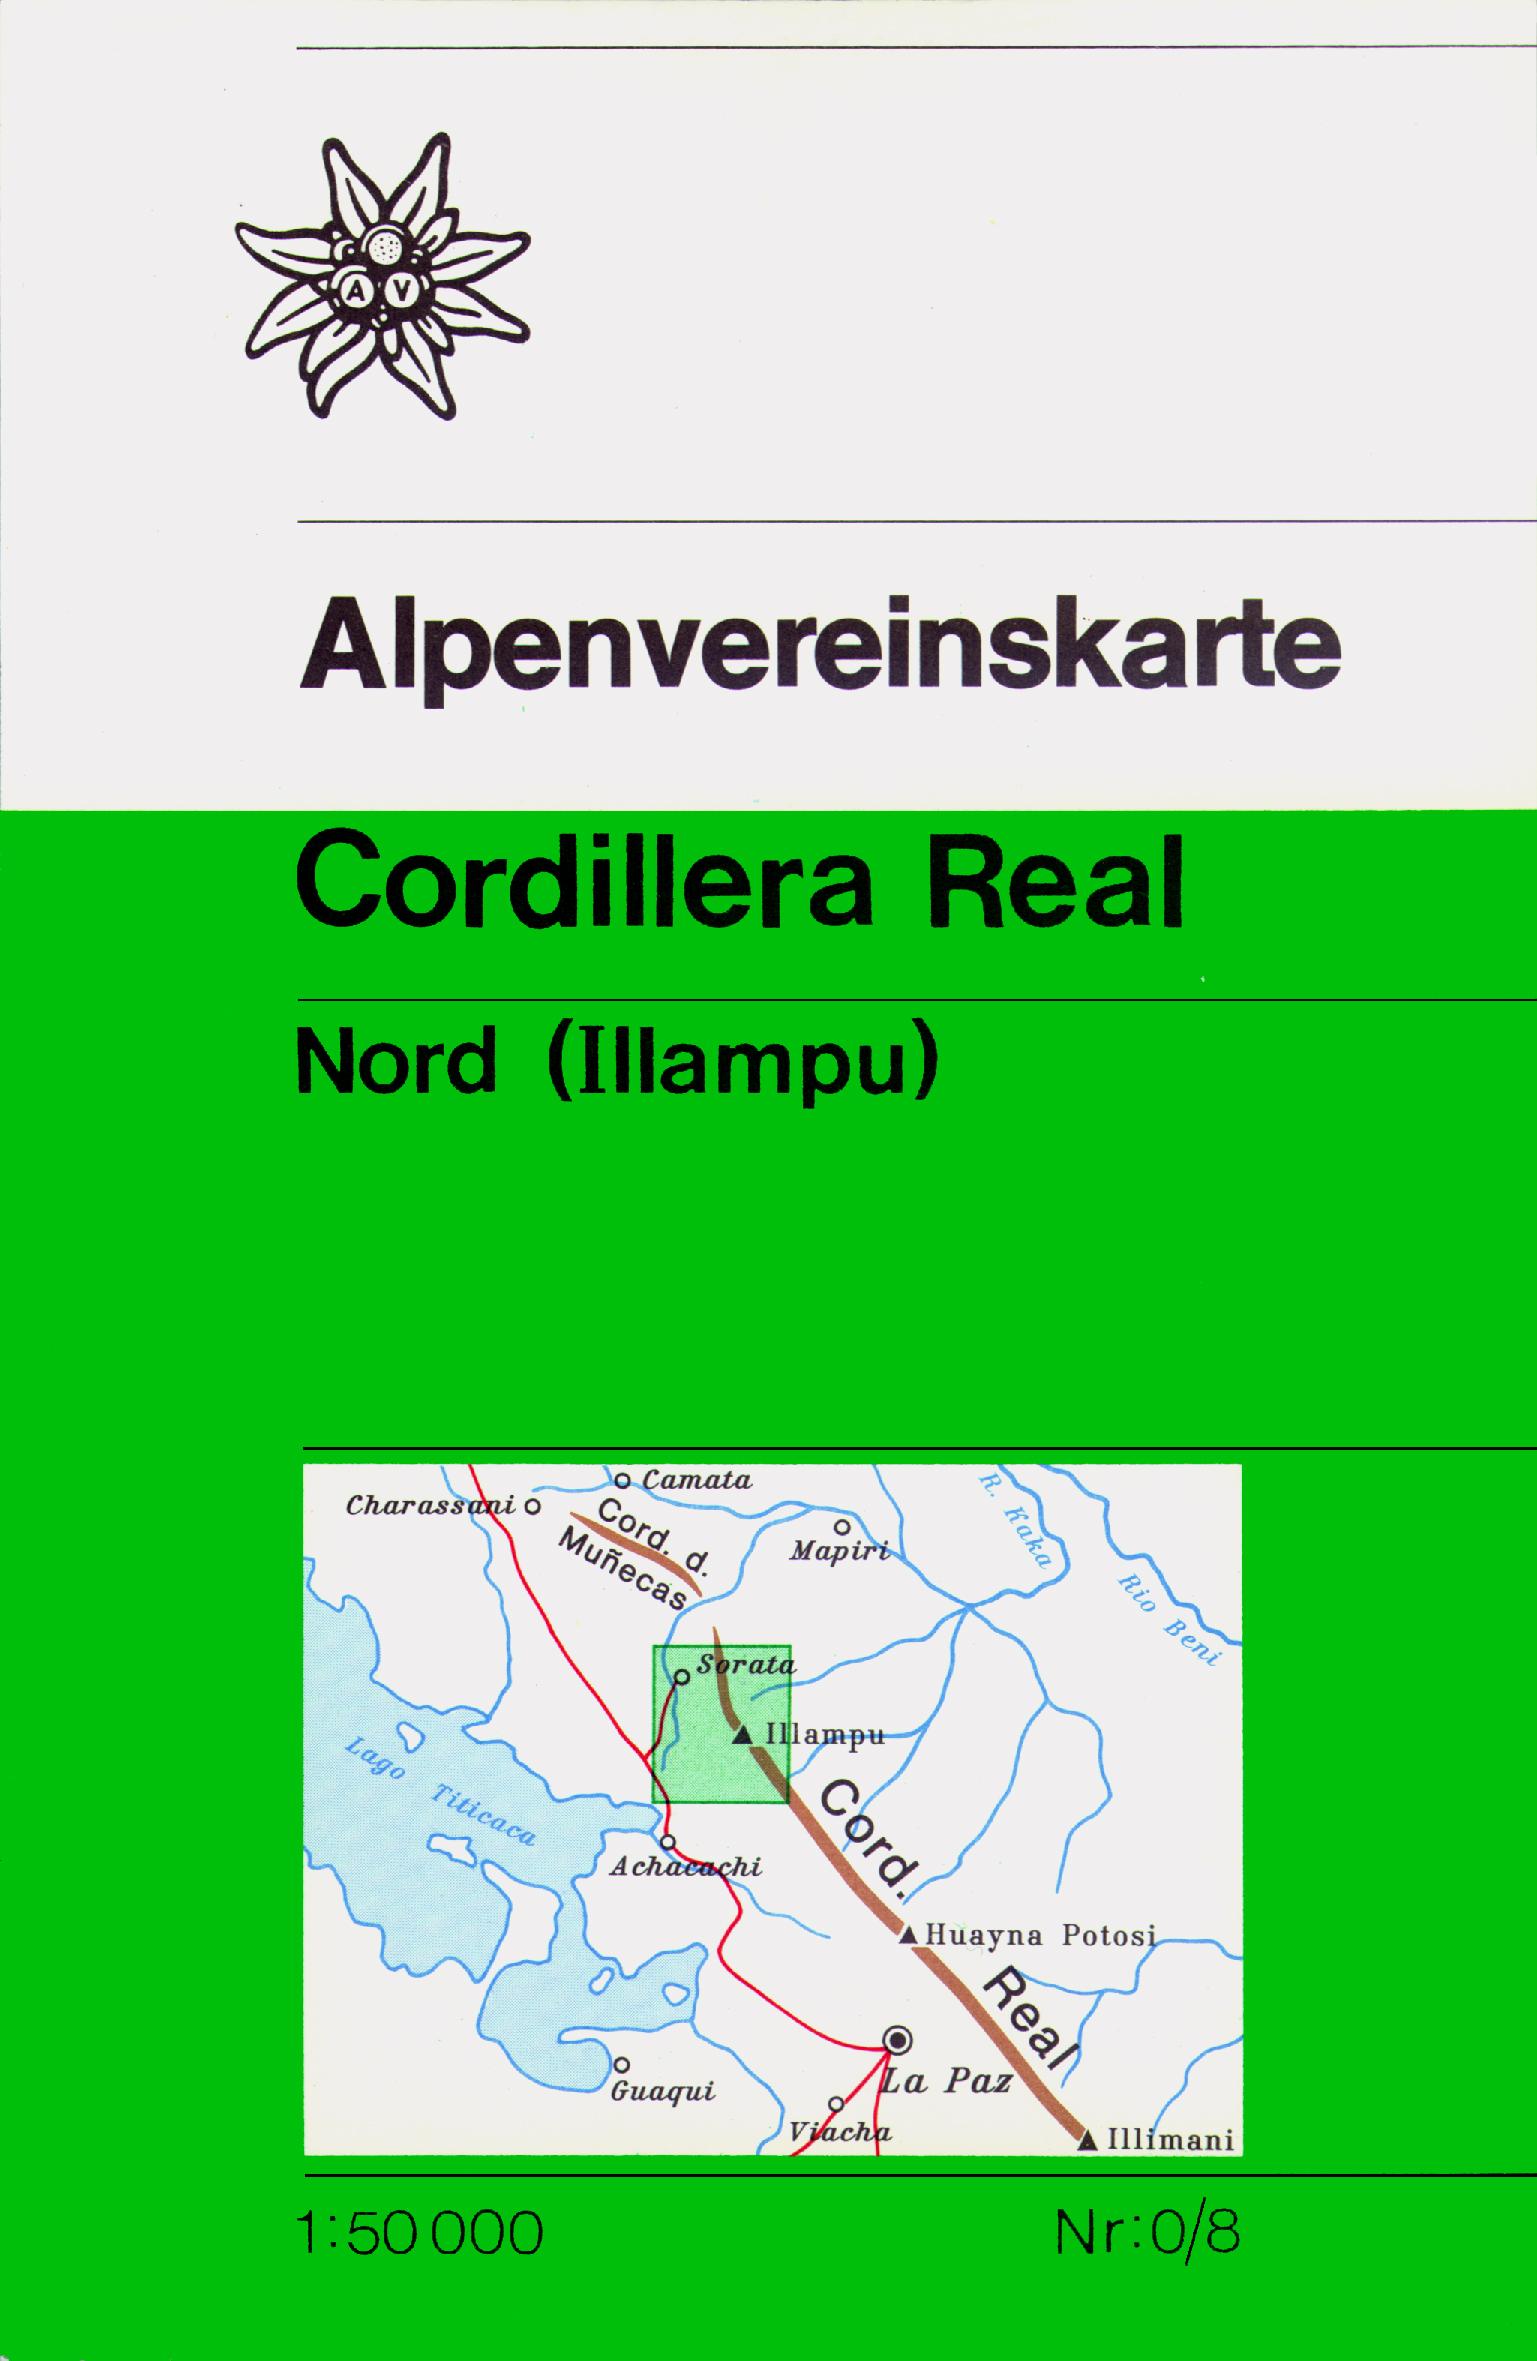 DAV Alpenvereinskarte 0/8 Cordillera Real Nord (Illampu - Bolivien) 1 : 50 000